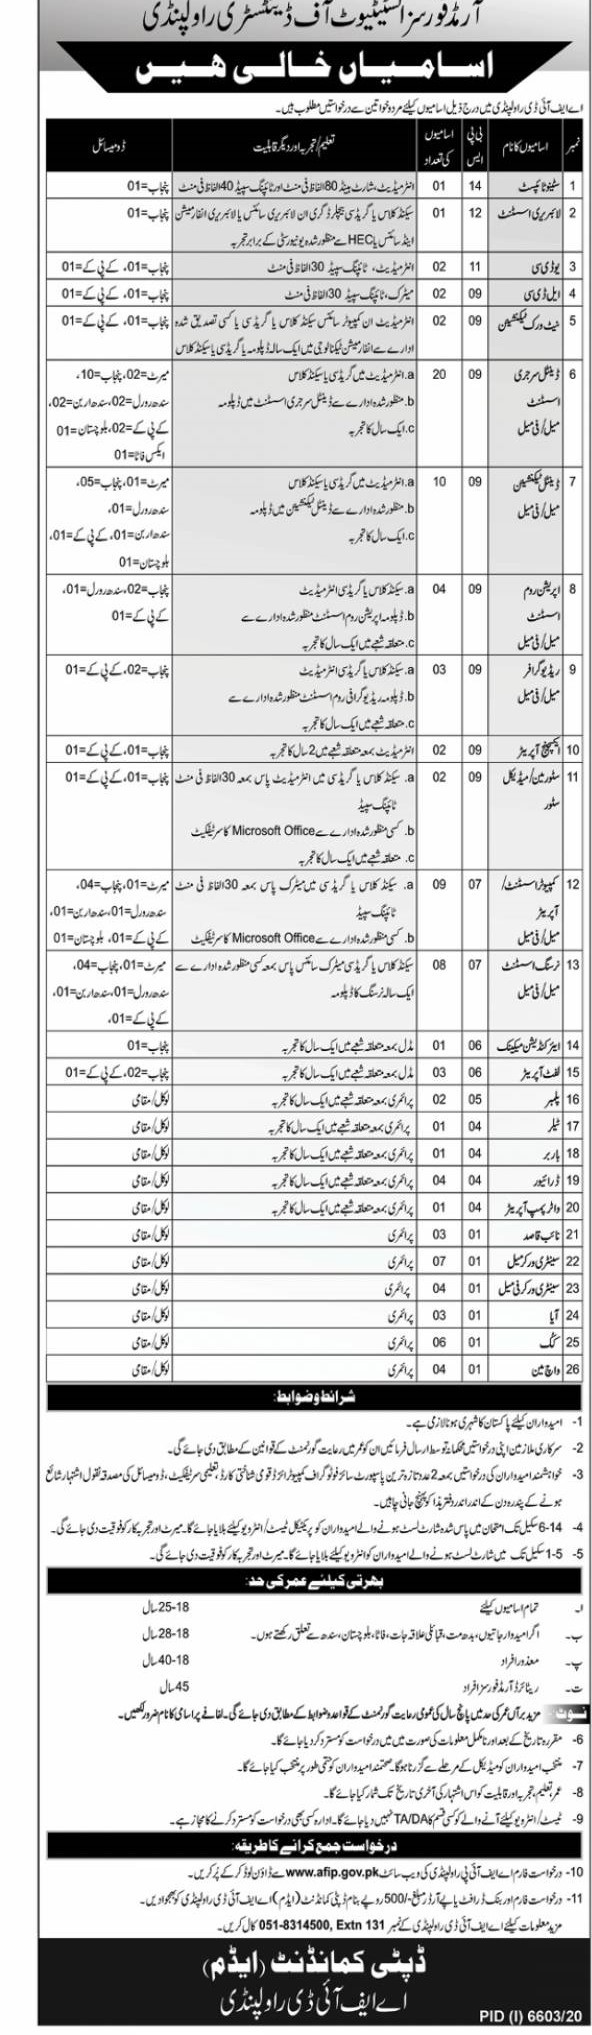 www.afip.gov.pk Jobs 2021 - Armed Forces Institute Of Dentistry Rawalpindi Jobs 2021 in Pakistan